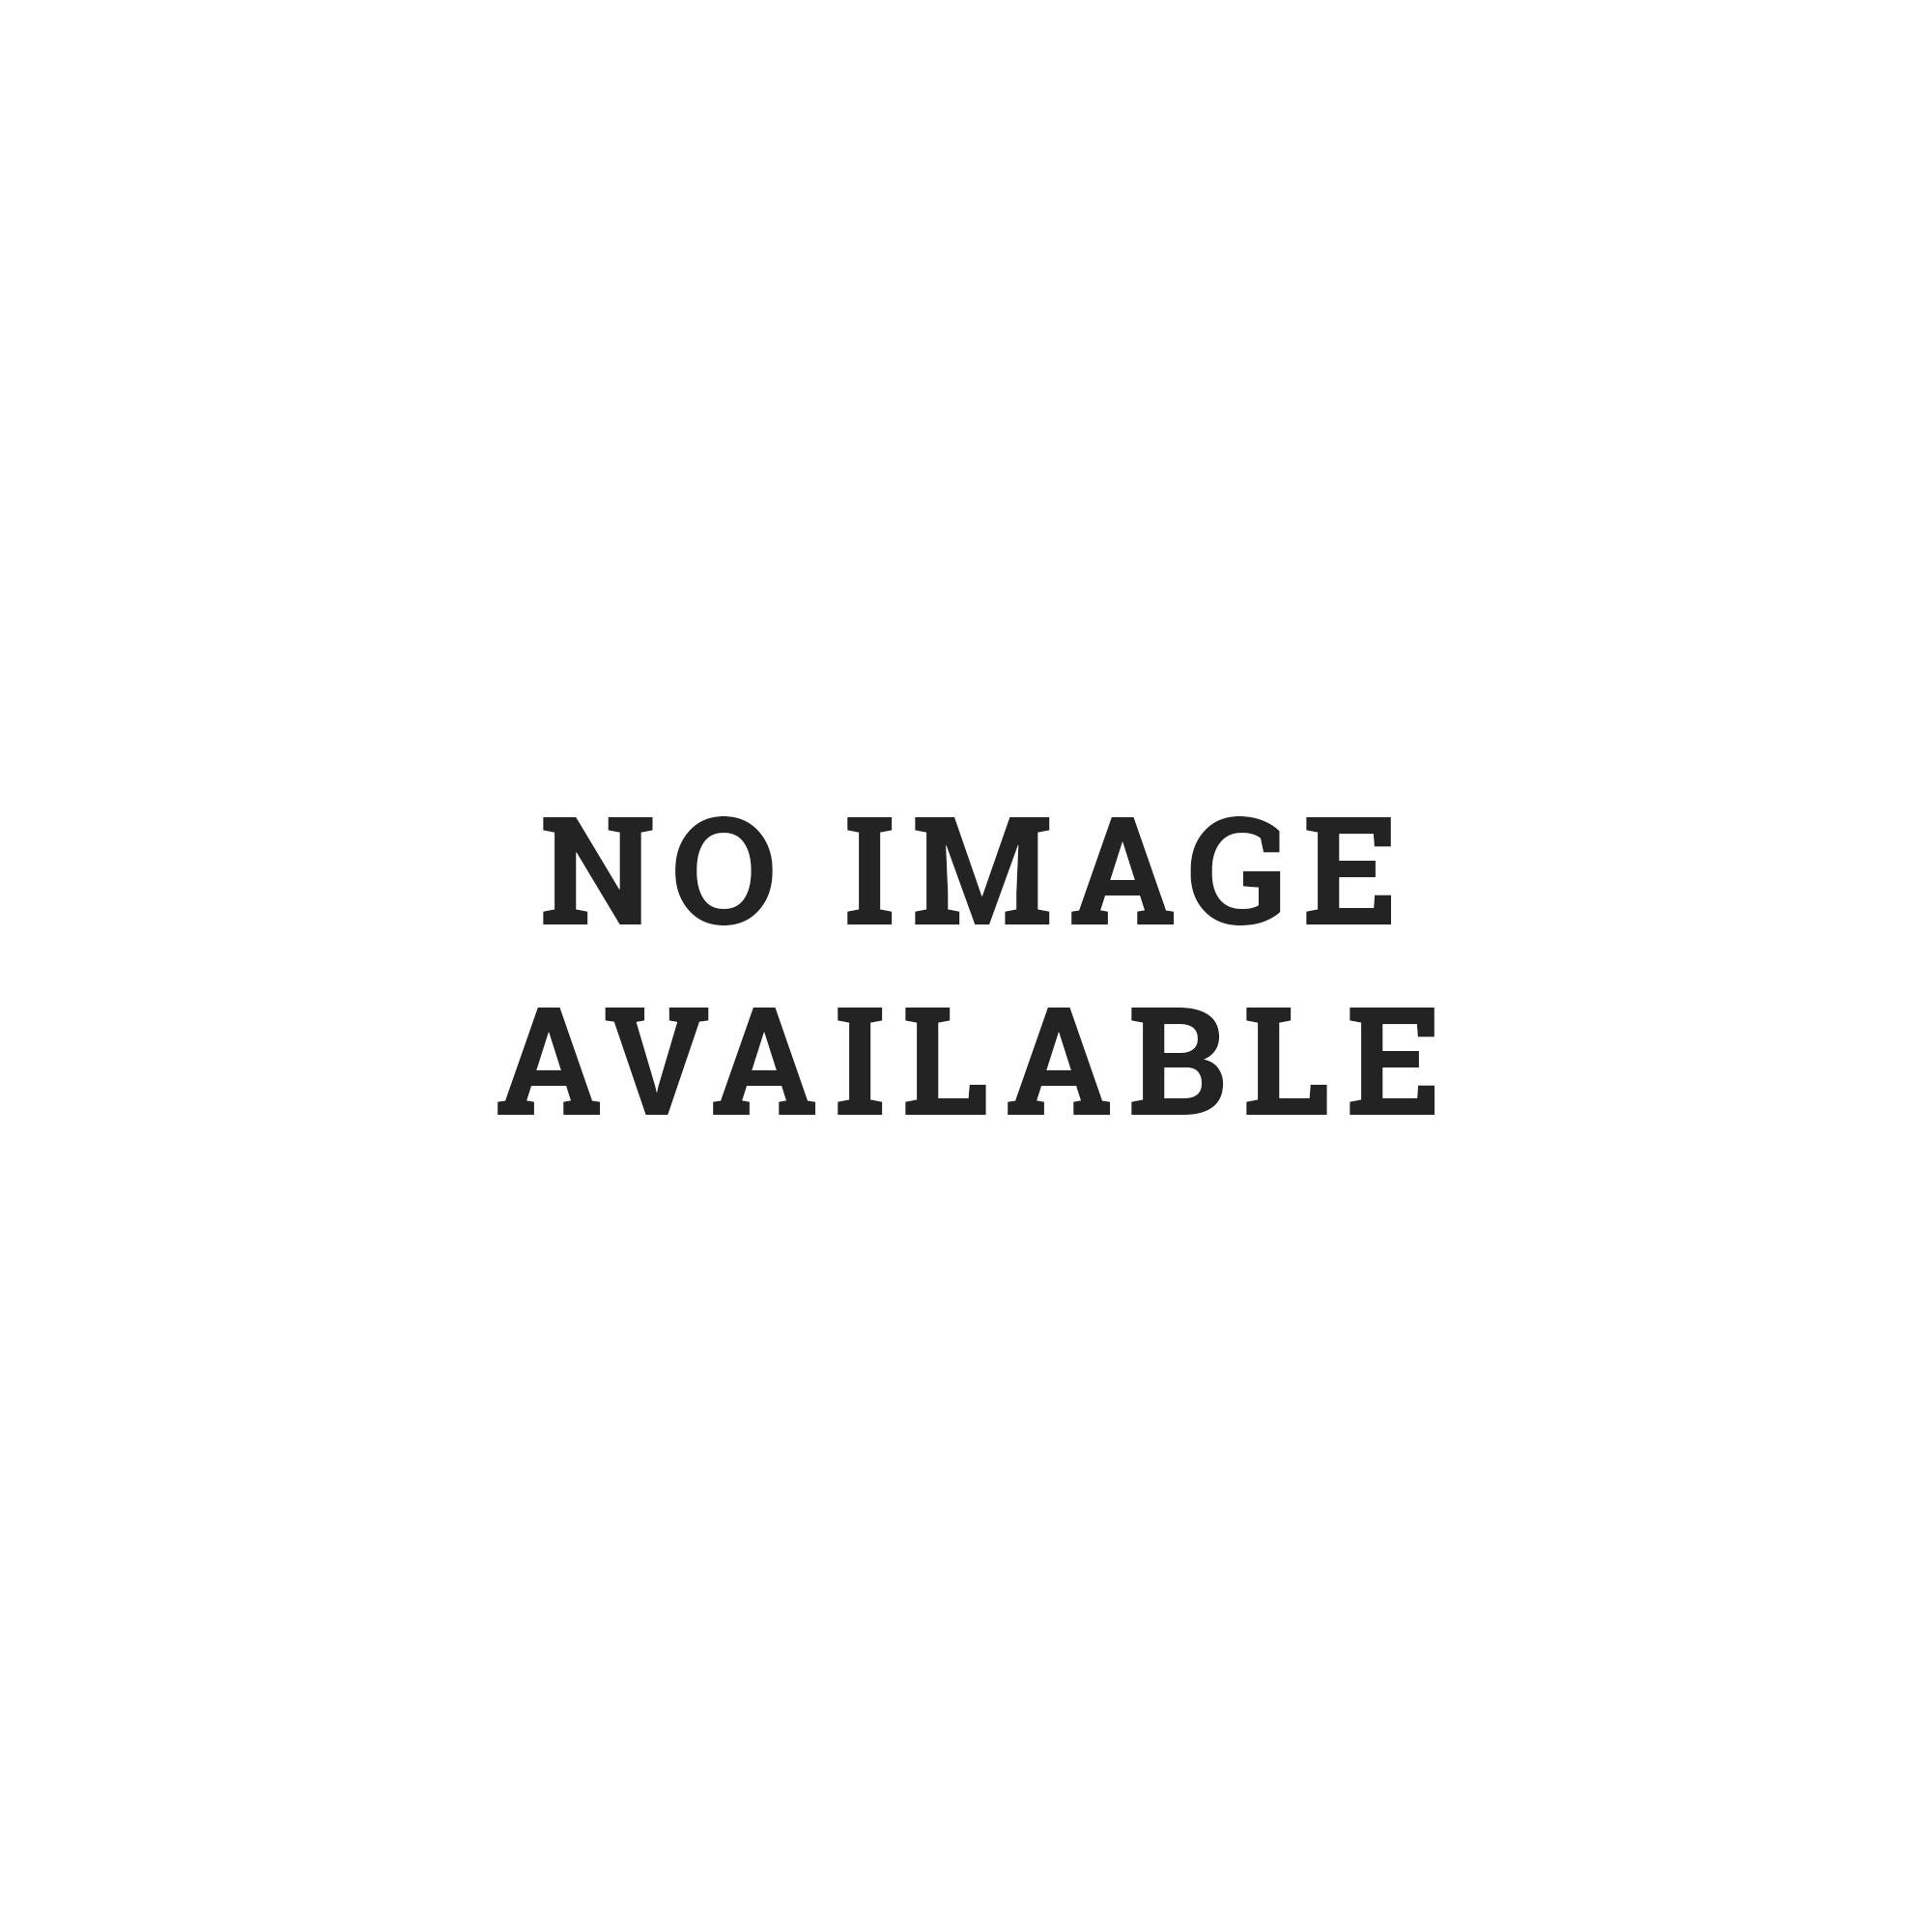 Dr Martens 8053 Unisex Leather 5-Eyelet Shoes - White And Black Aztec d16e3f4254